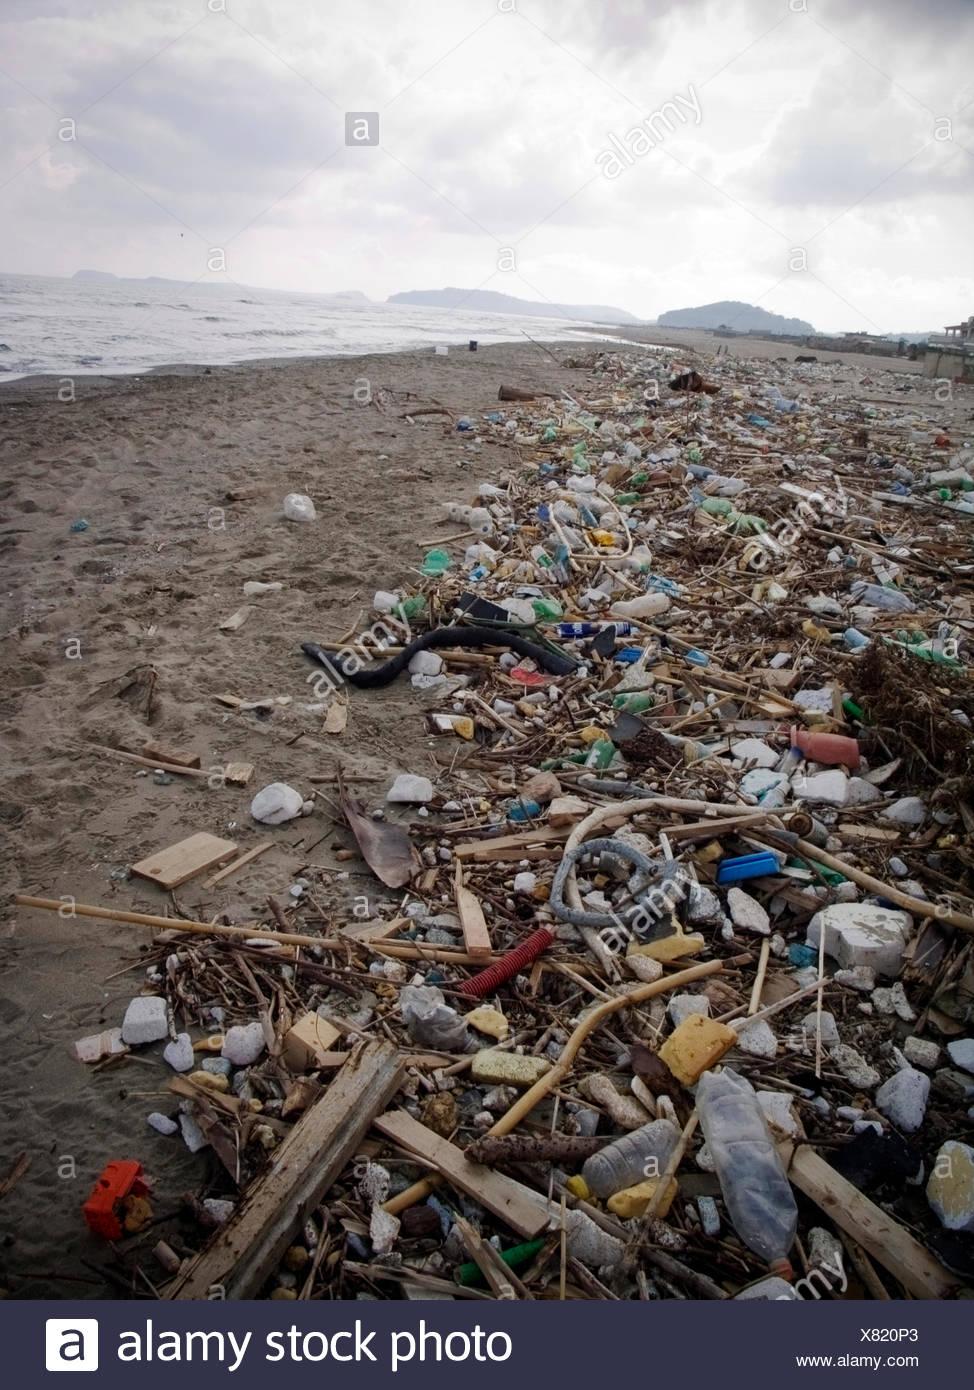 Polluted beach of Licola, Giugliano, Naples, Campania, Italy, Europe - Stock Image